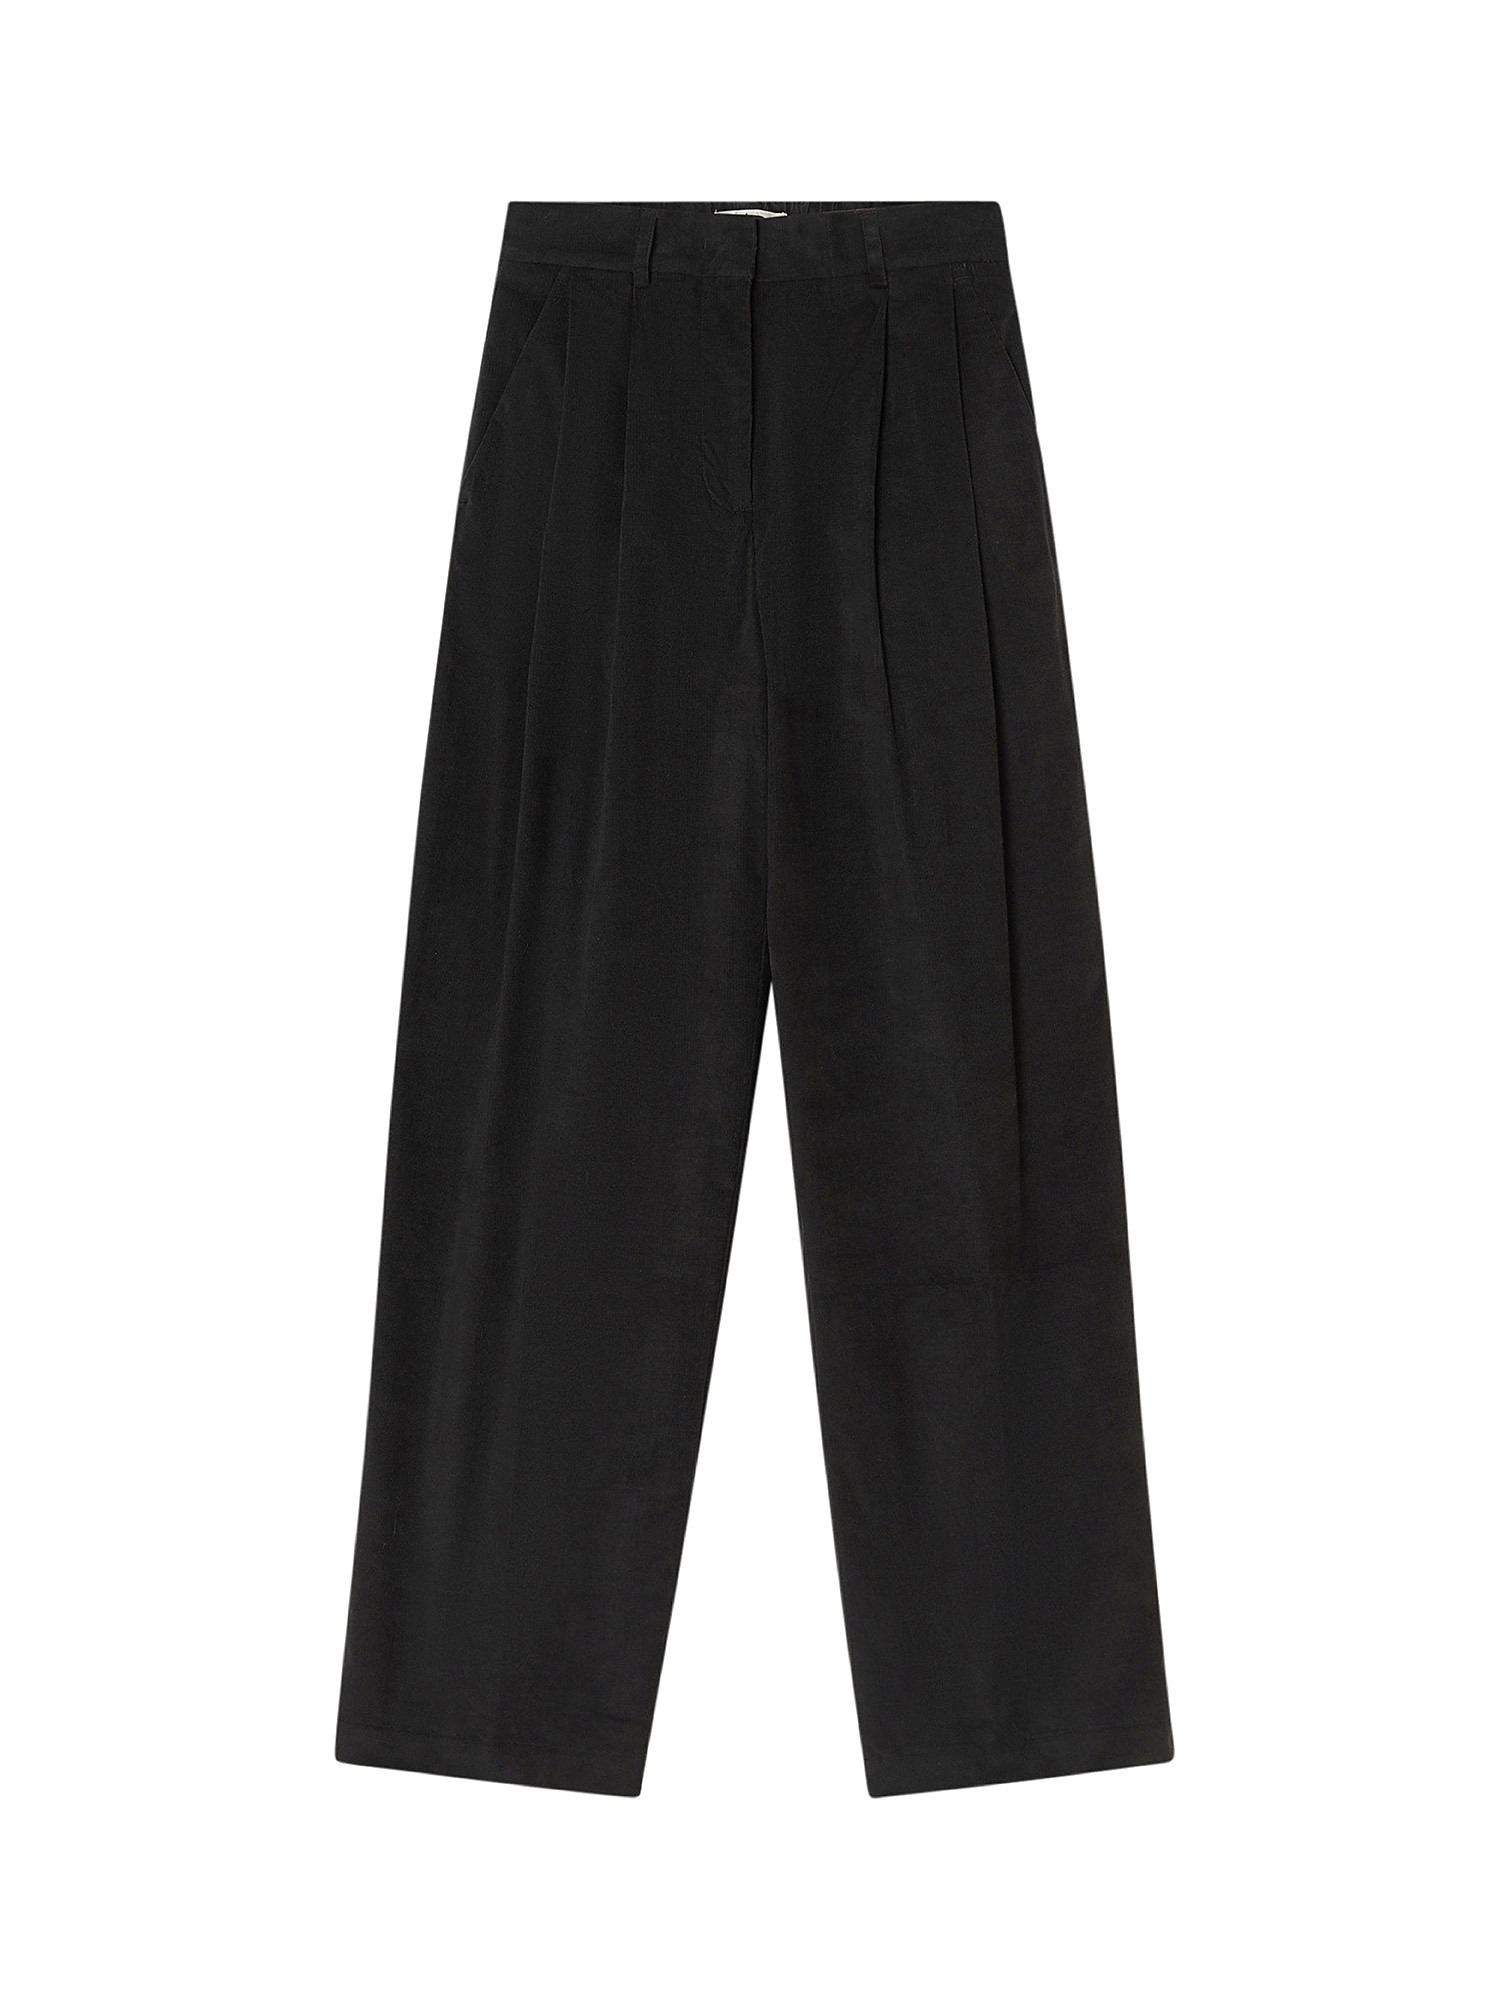 Pantaloni, Beige, large image number 0